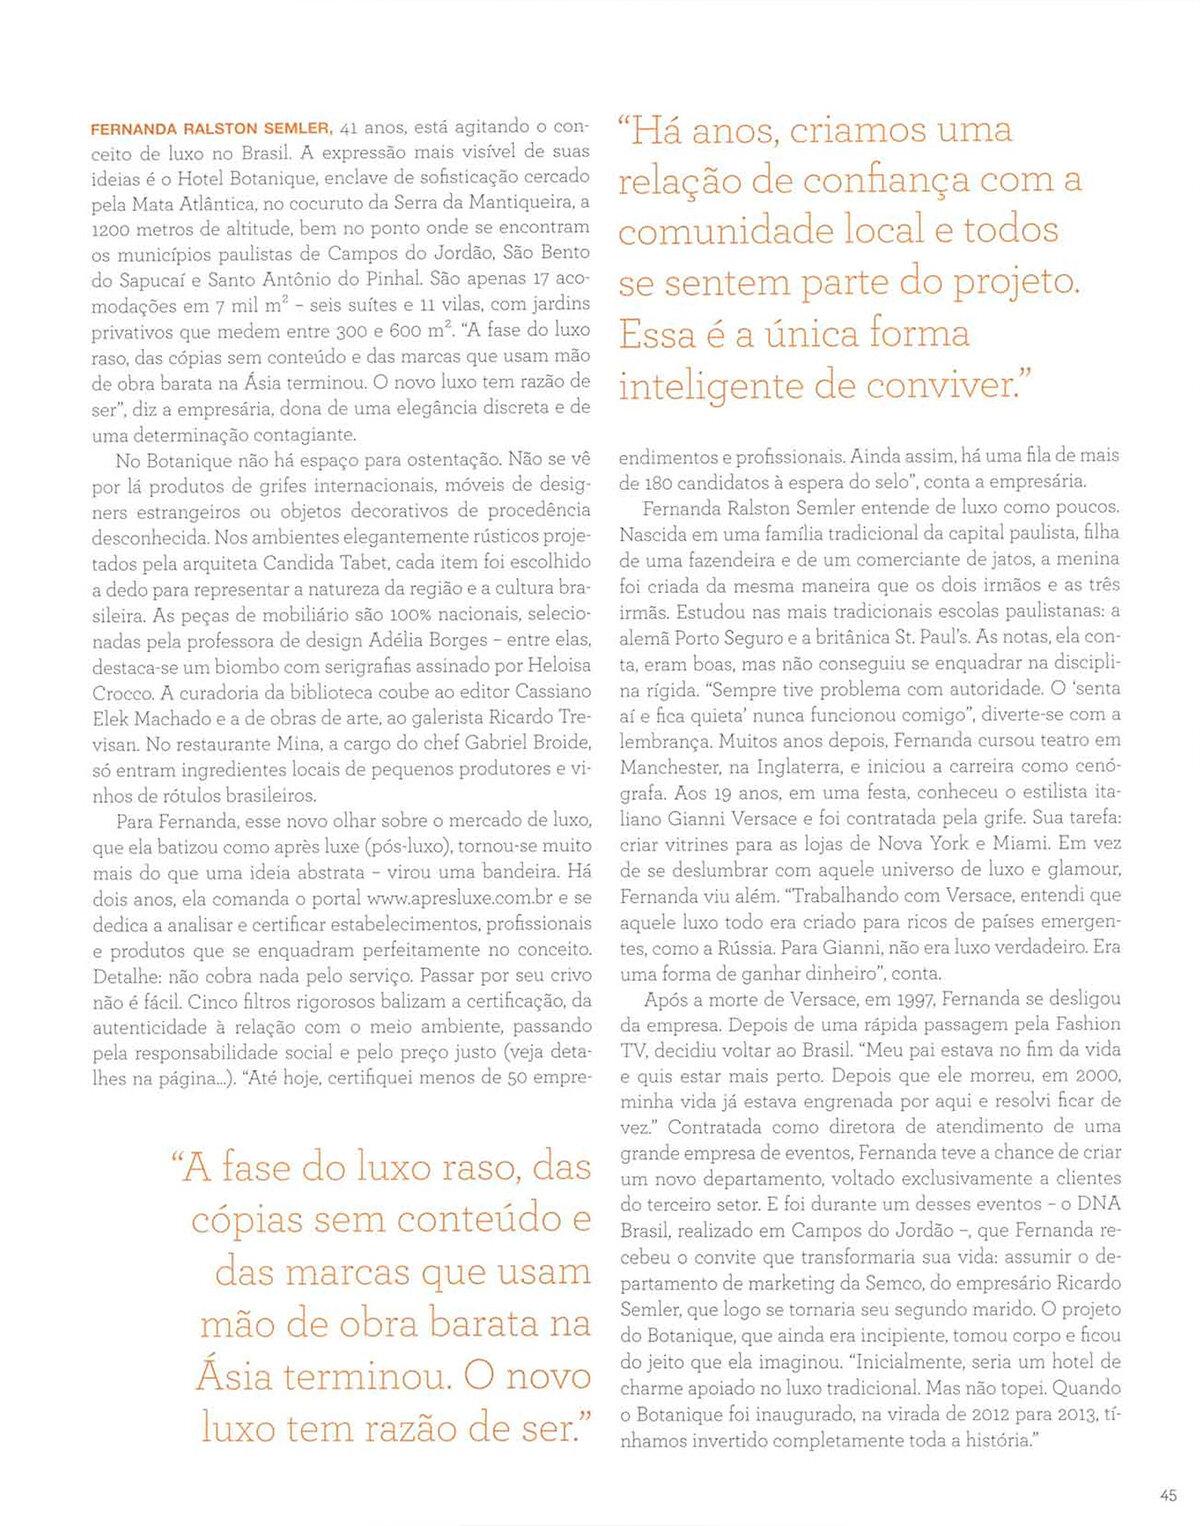 revista-expressions-american-express-5.jpg